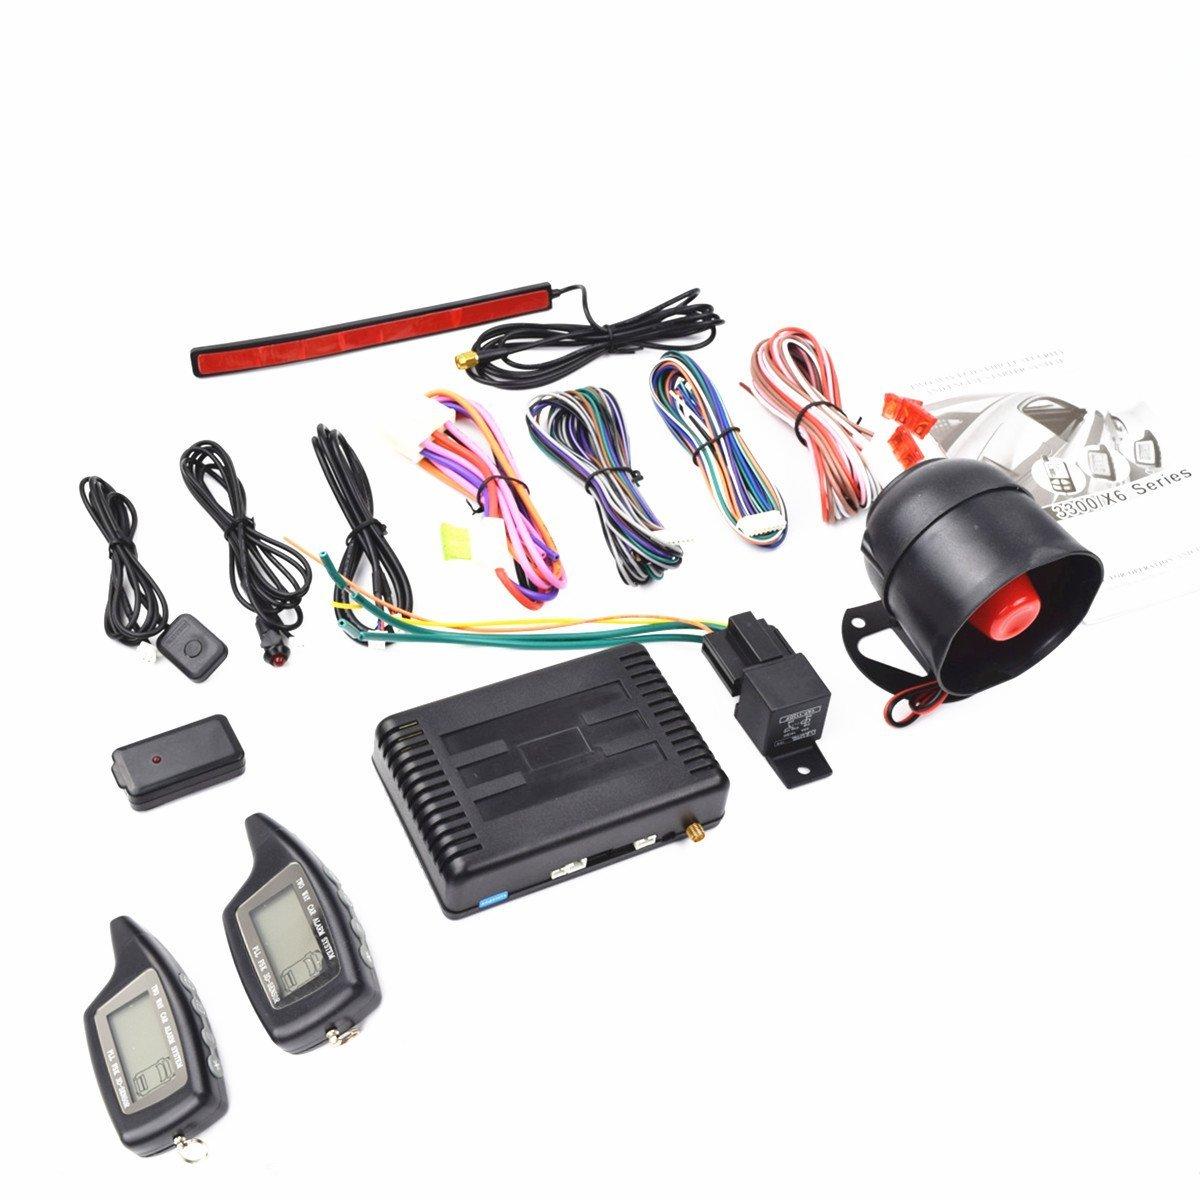 CarBest Vehicle Security Paging Car Alarm 2 Way LCD Sensor Remote Engine Start System Kit Automatic | Passive Keyless Entry(PKE) | Car Burglar Alarm System - CA-3300C